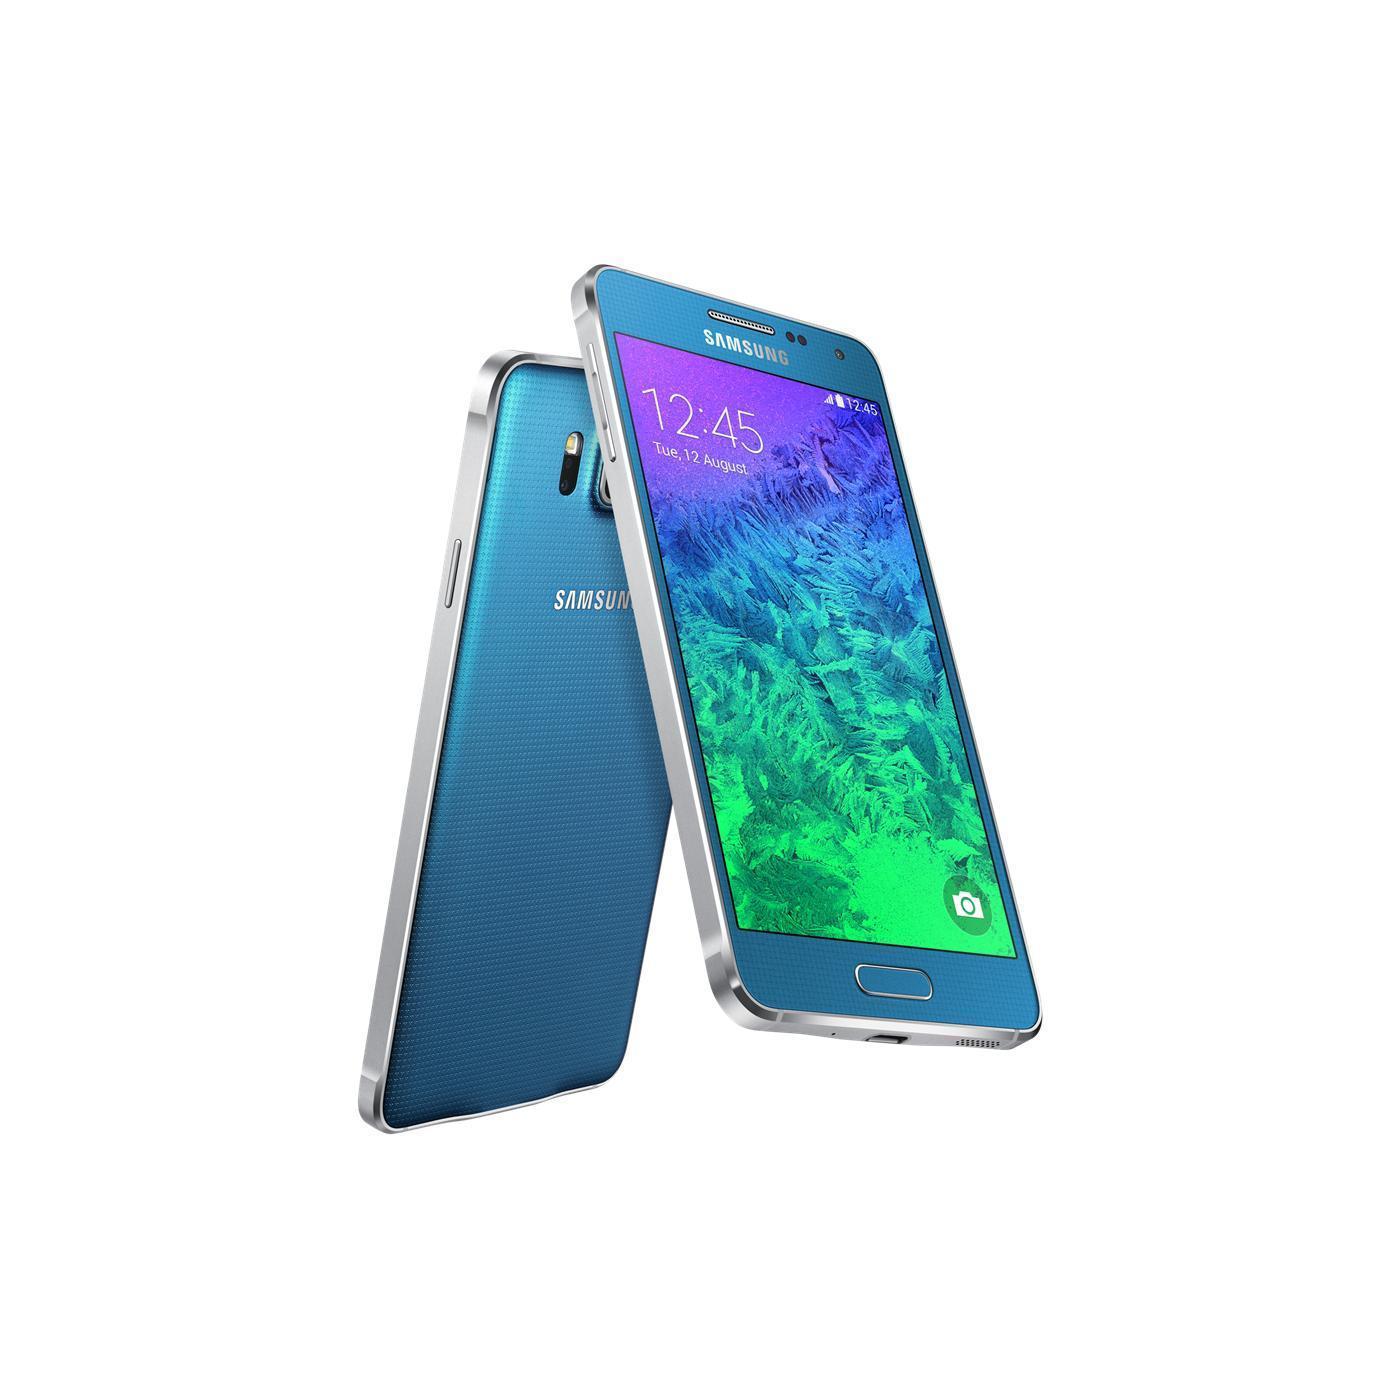 Samsung Galaxy Alpha 32 Go - Bleu - Débloqué